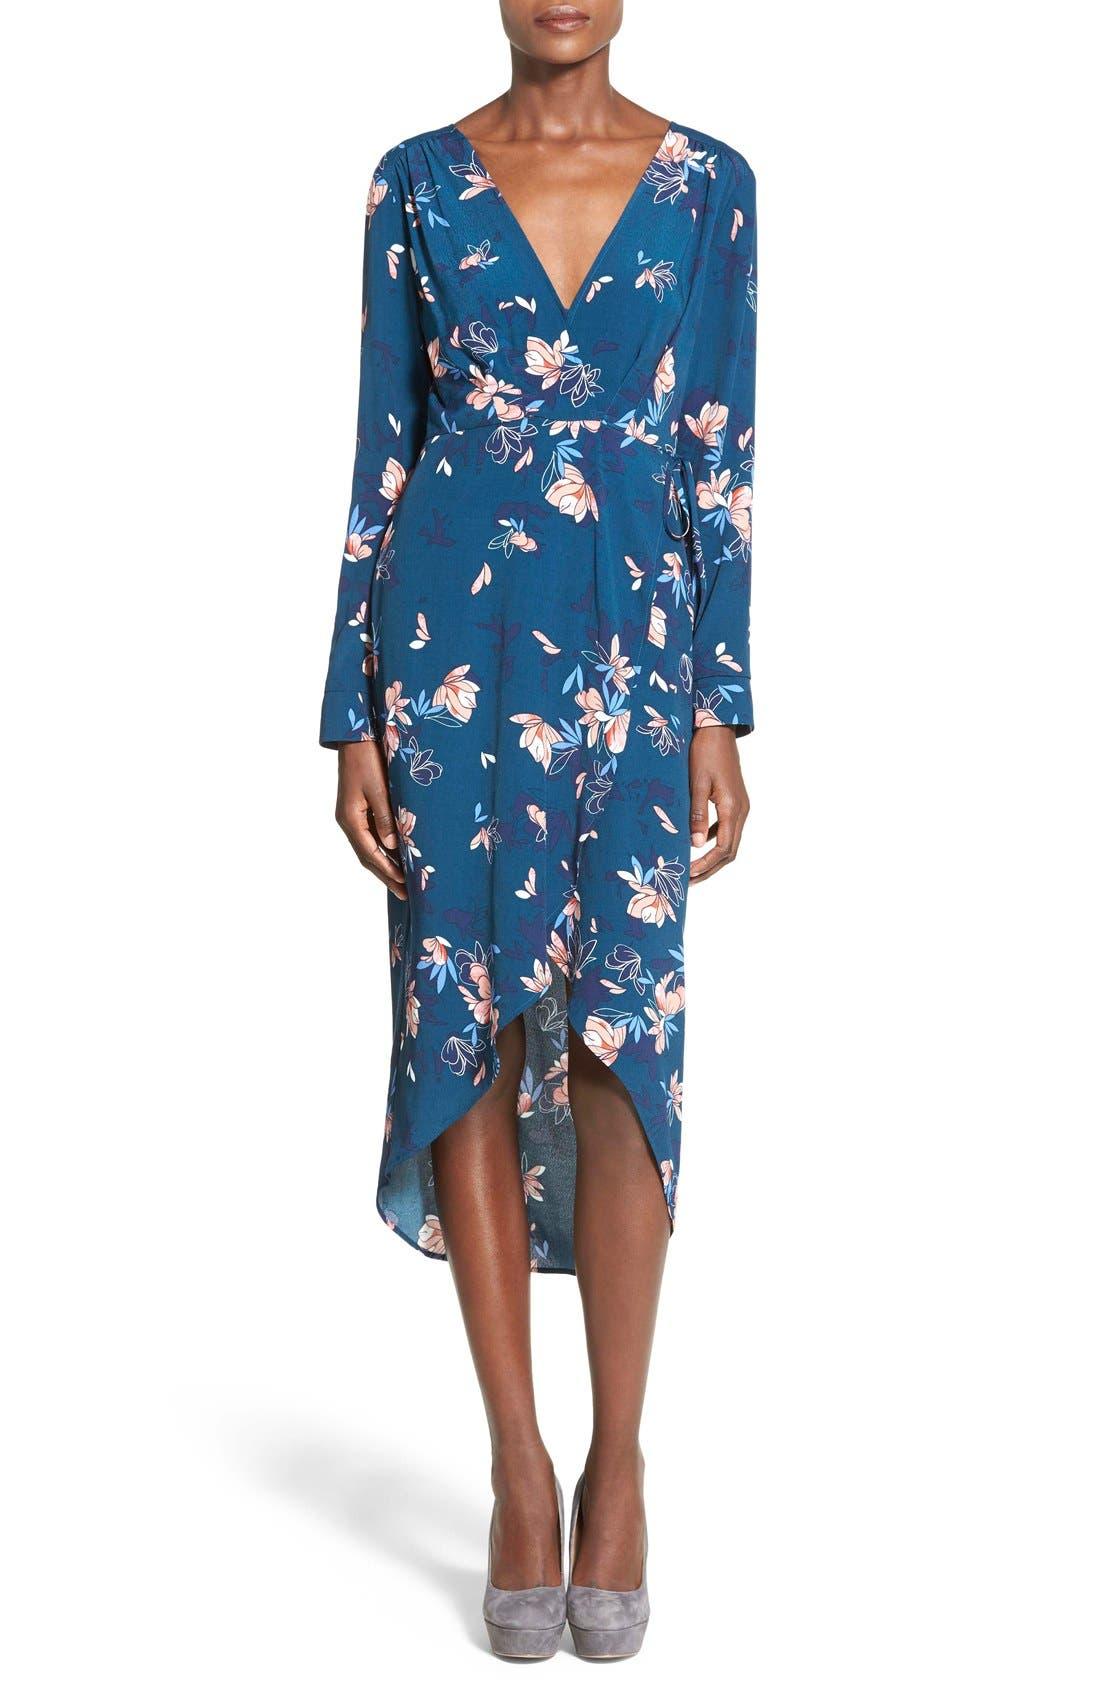 ASTR Wrap Front High/Low Dress,                         Main,                         color, Teal Multi Floral